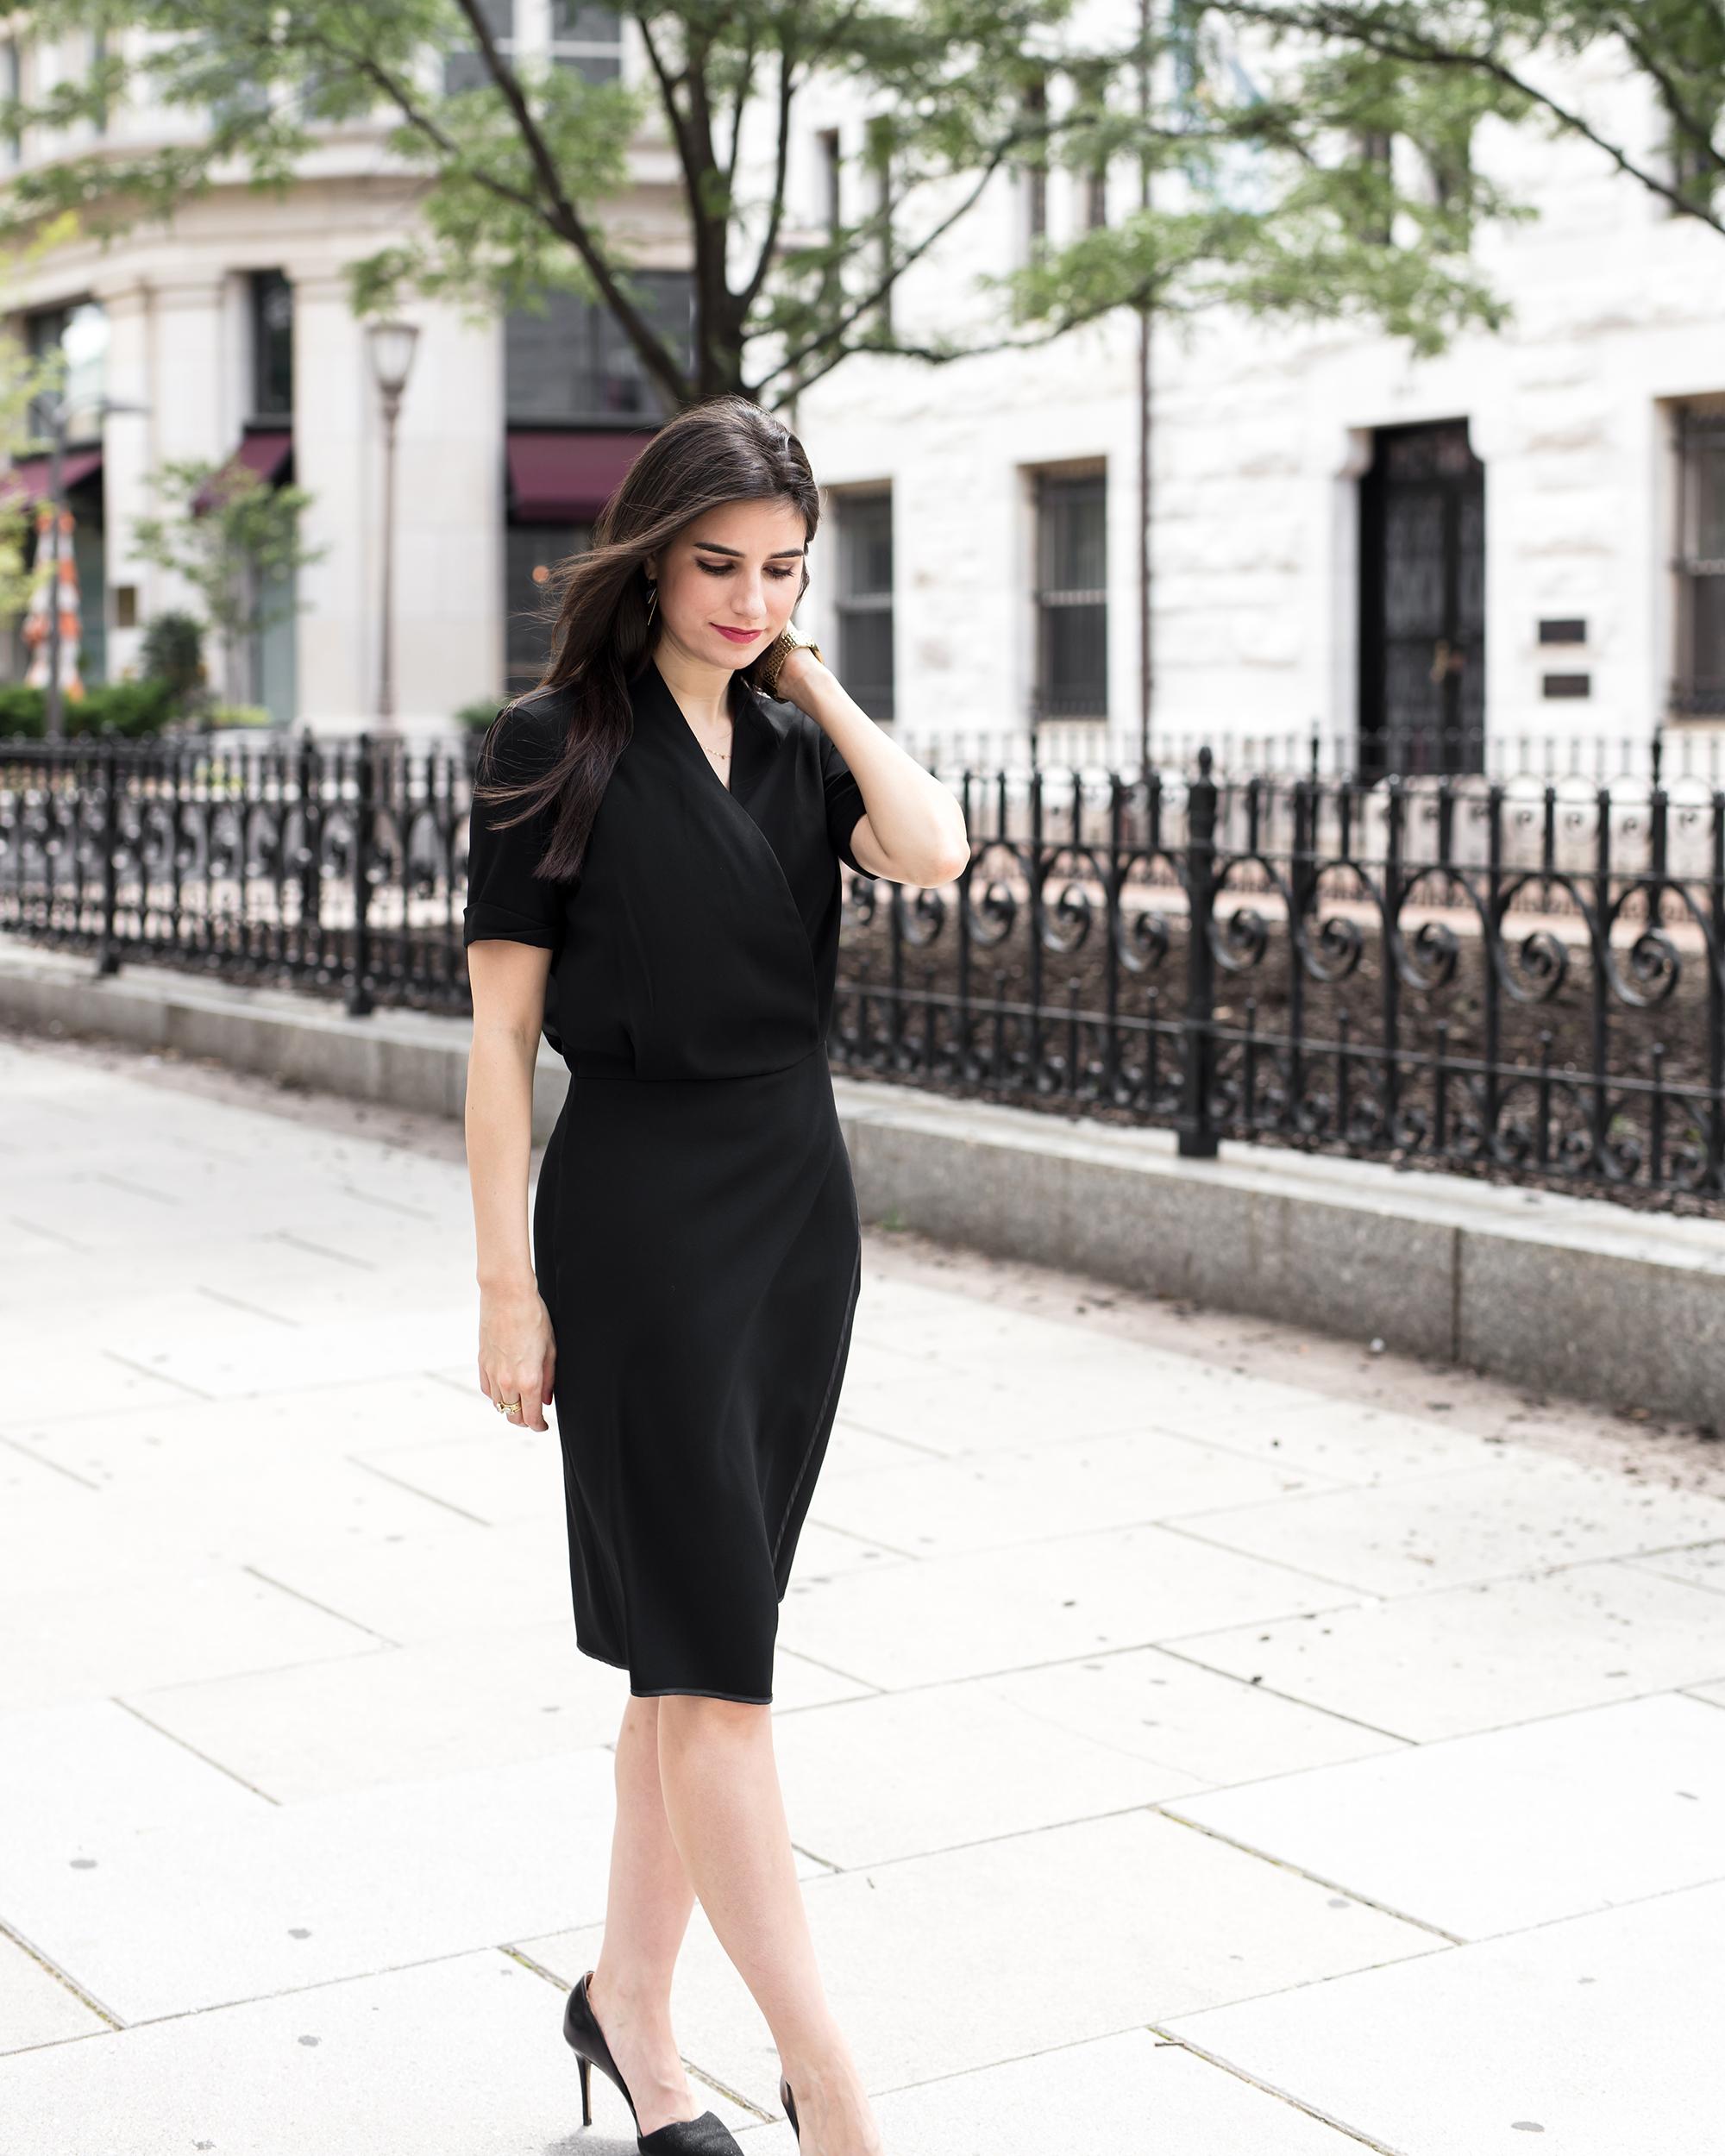 black dress walking